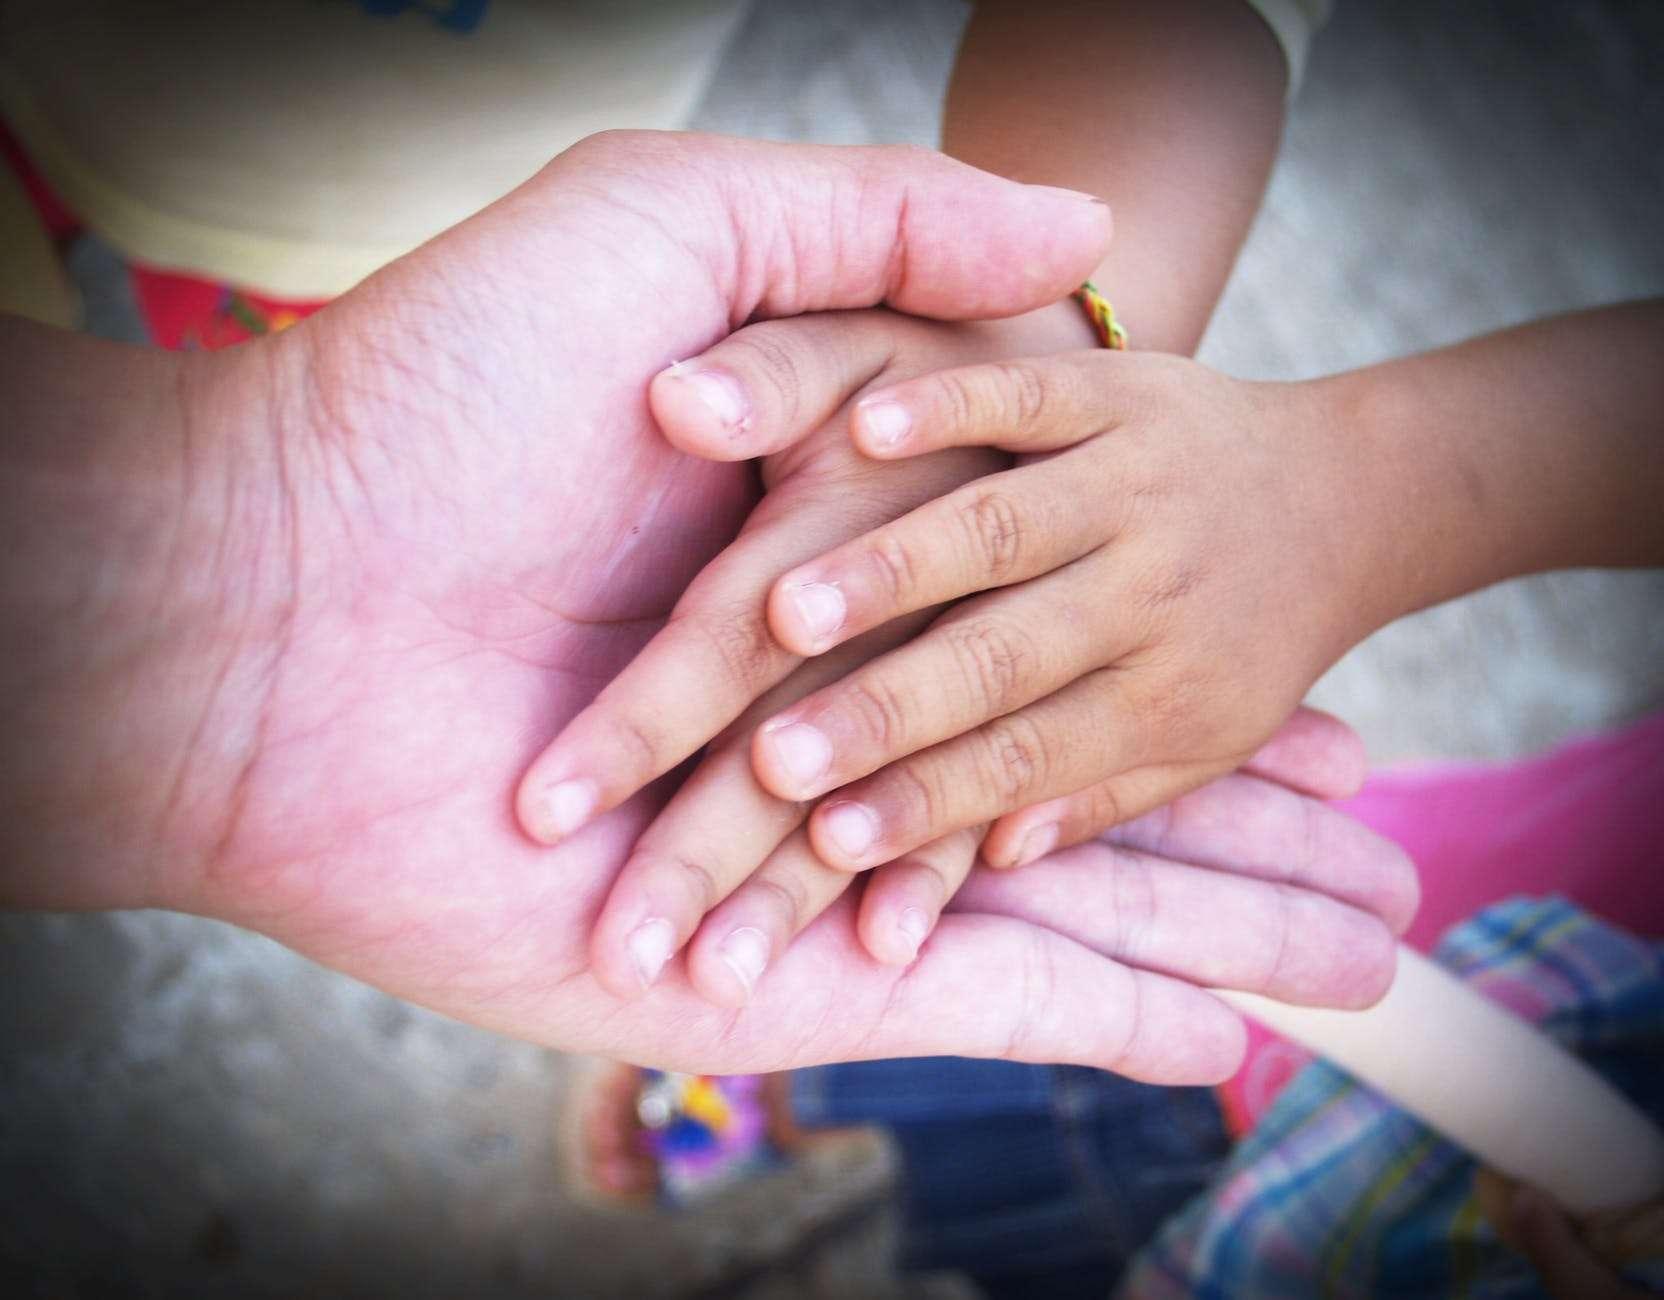 Children's Health - Common Causes of Skin Rashes